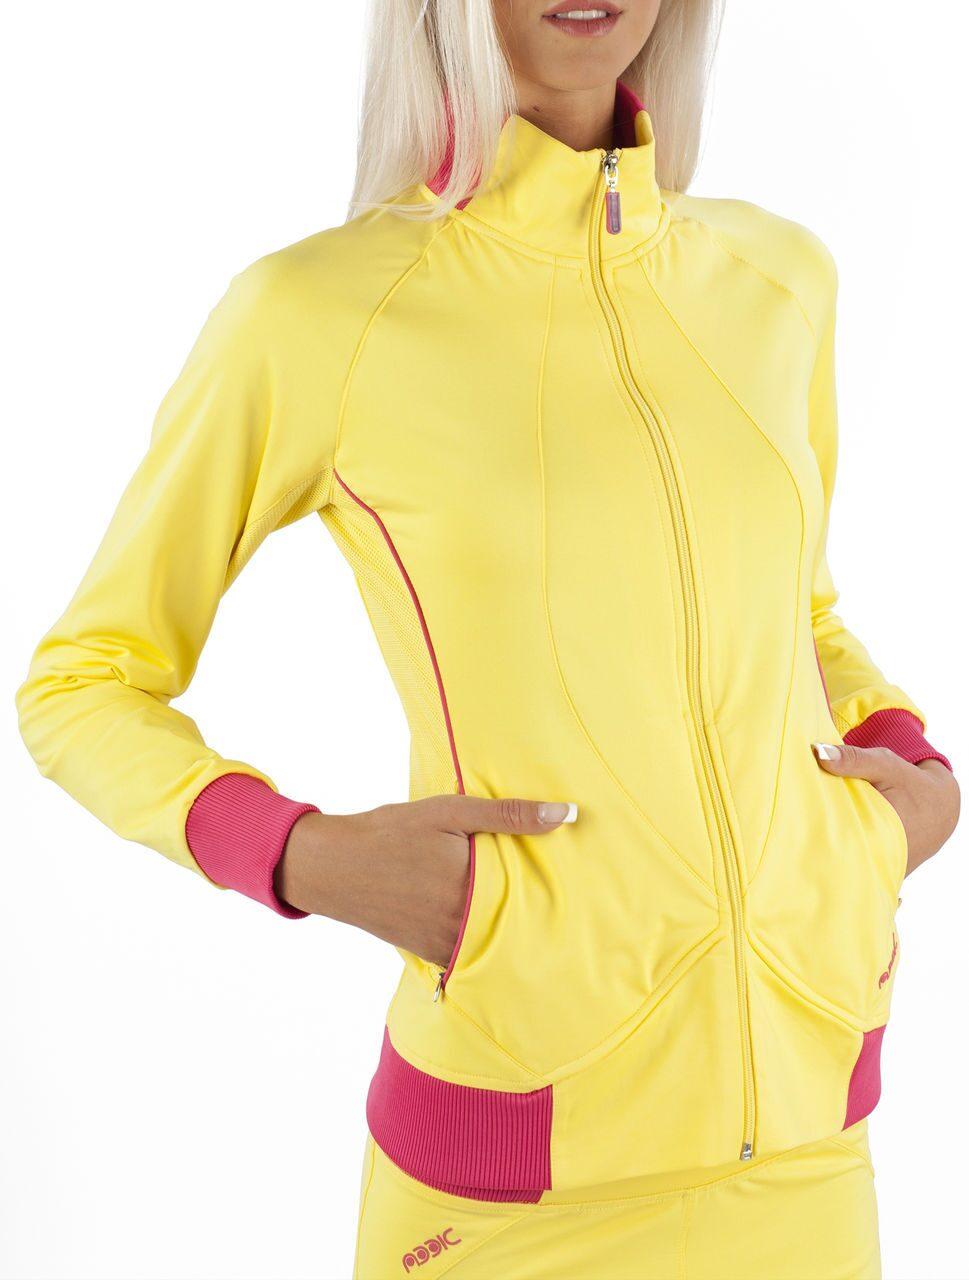 Женский спортивный костюм желтый